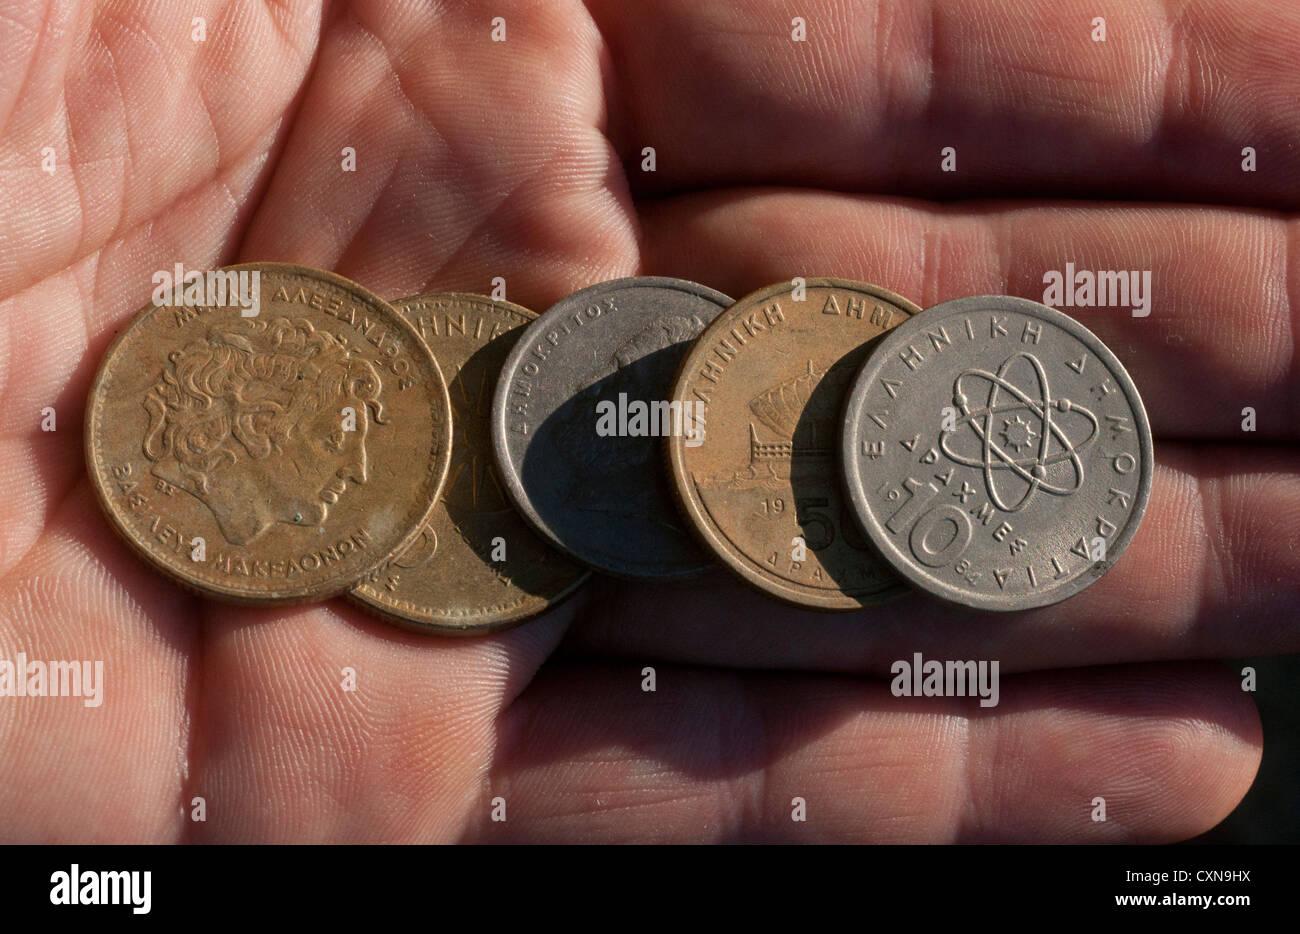 Greek Drachma coins, Greece - Stock Image